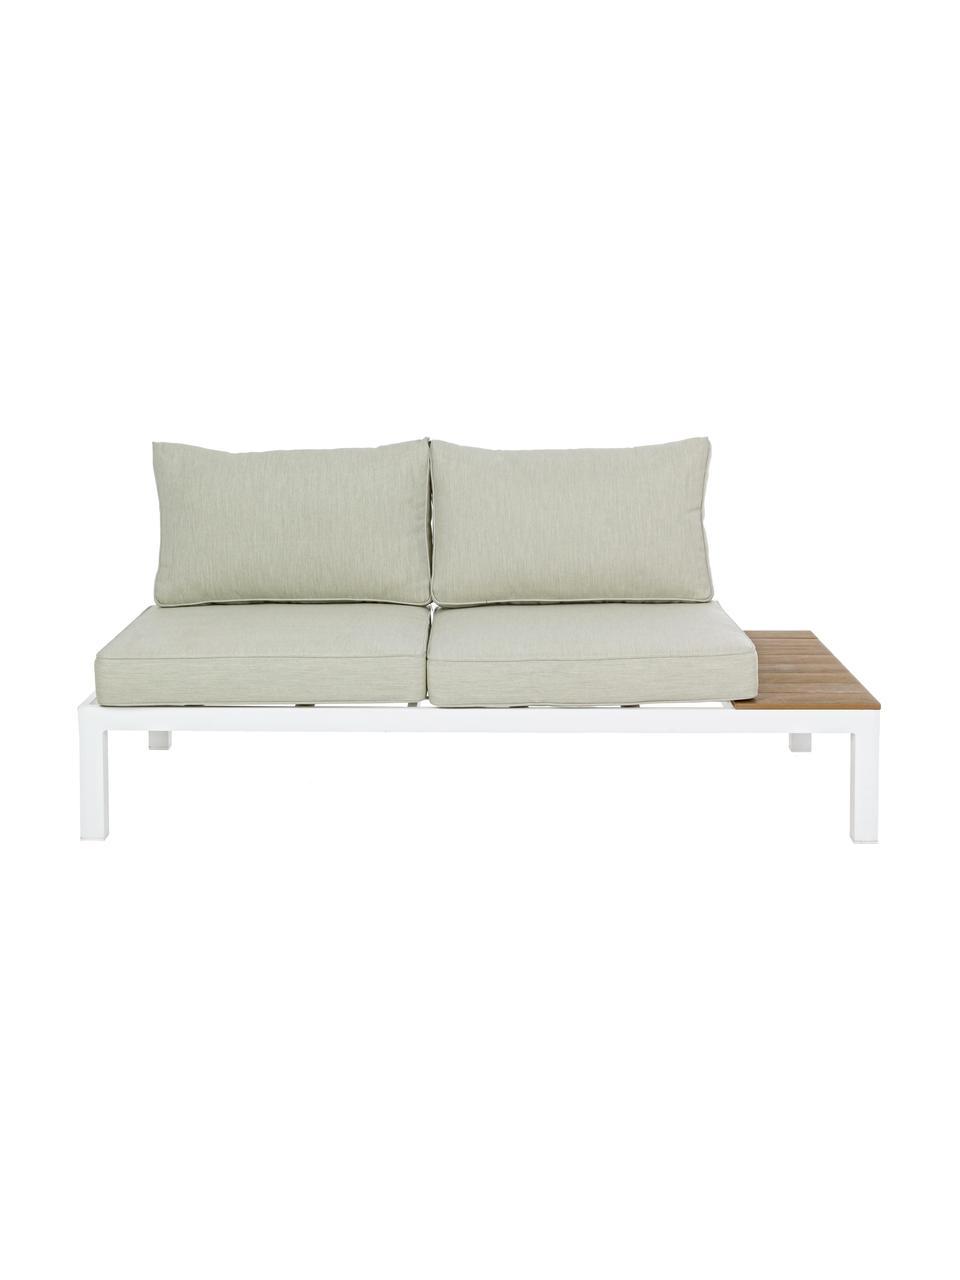 Salon de jardin aluminium Elias, 4élém., Blanc, bois de teck, beige